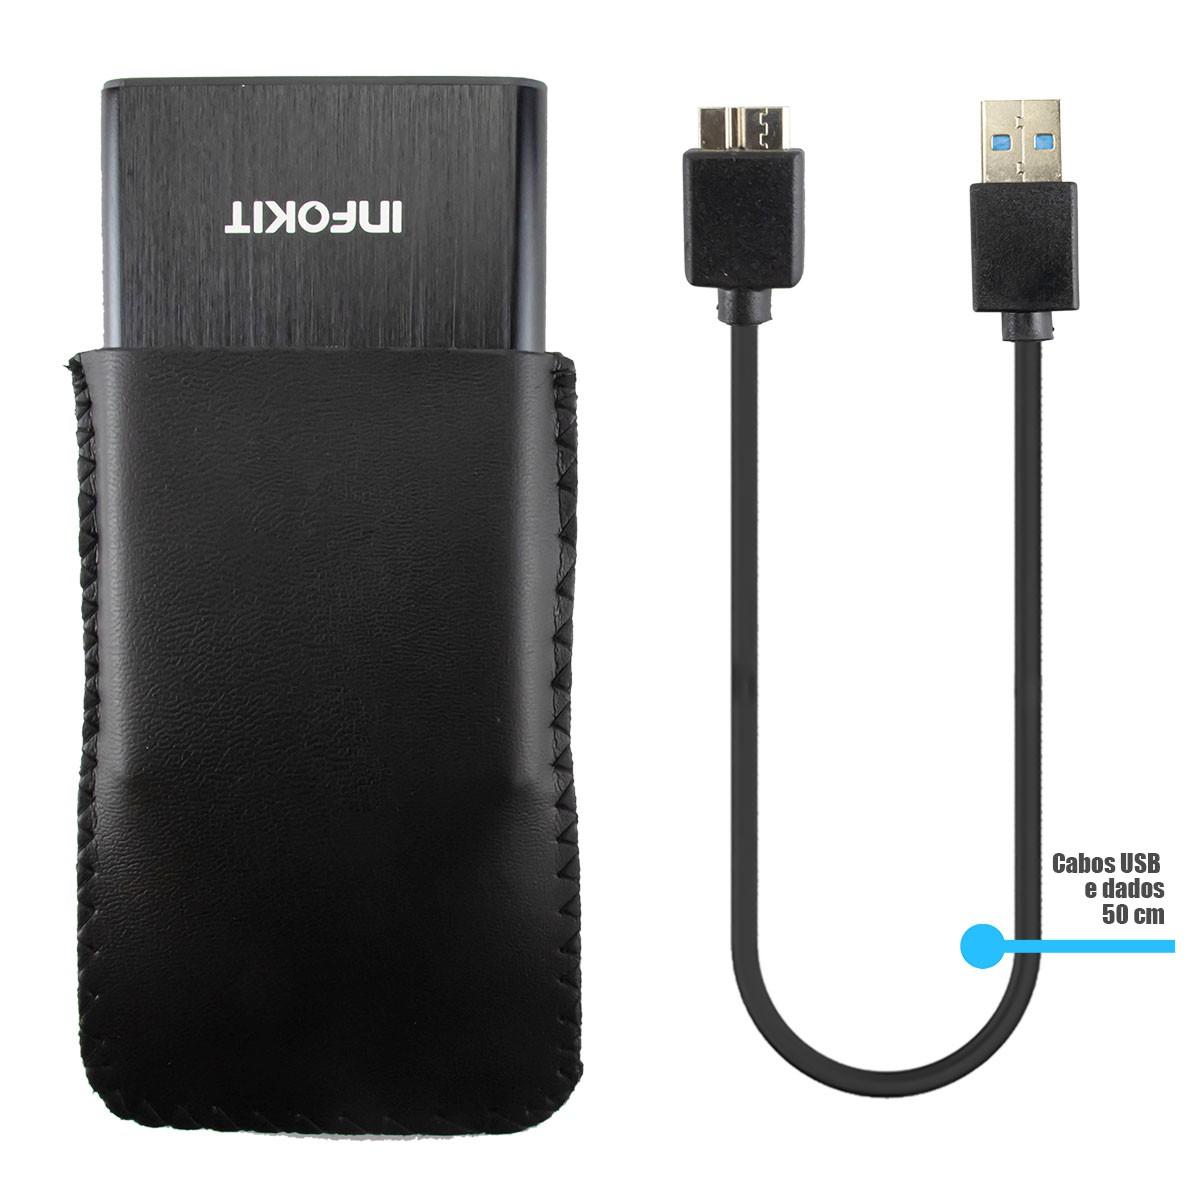 "KIT 5x Case para HD de Notebook 2,5"" Externo USB 3.0 e SATA II Alumínio Infokit ECASE-330"